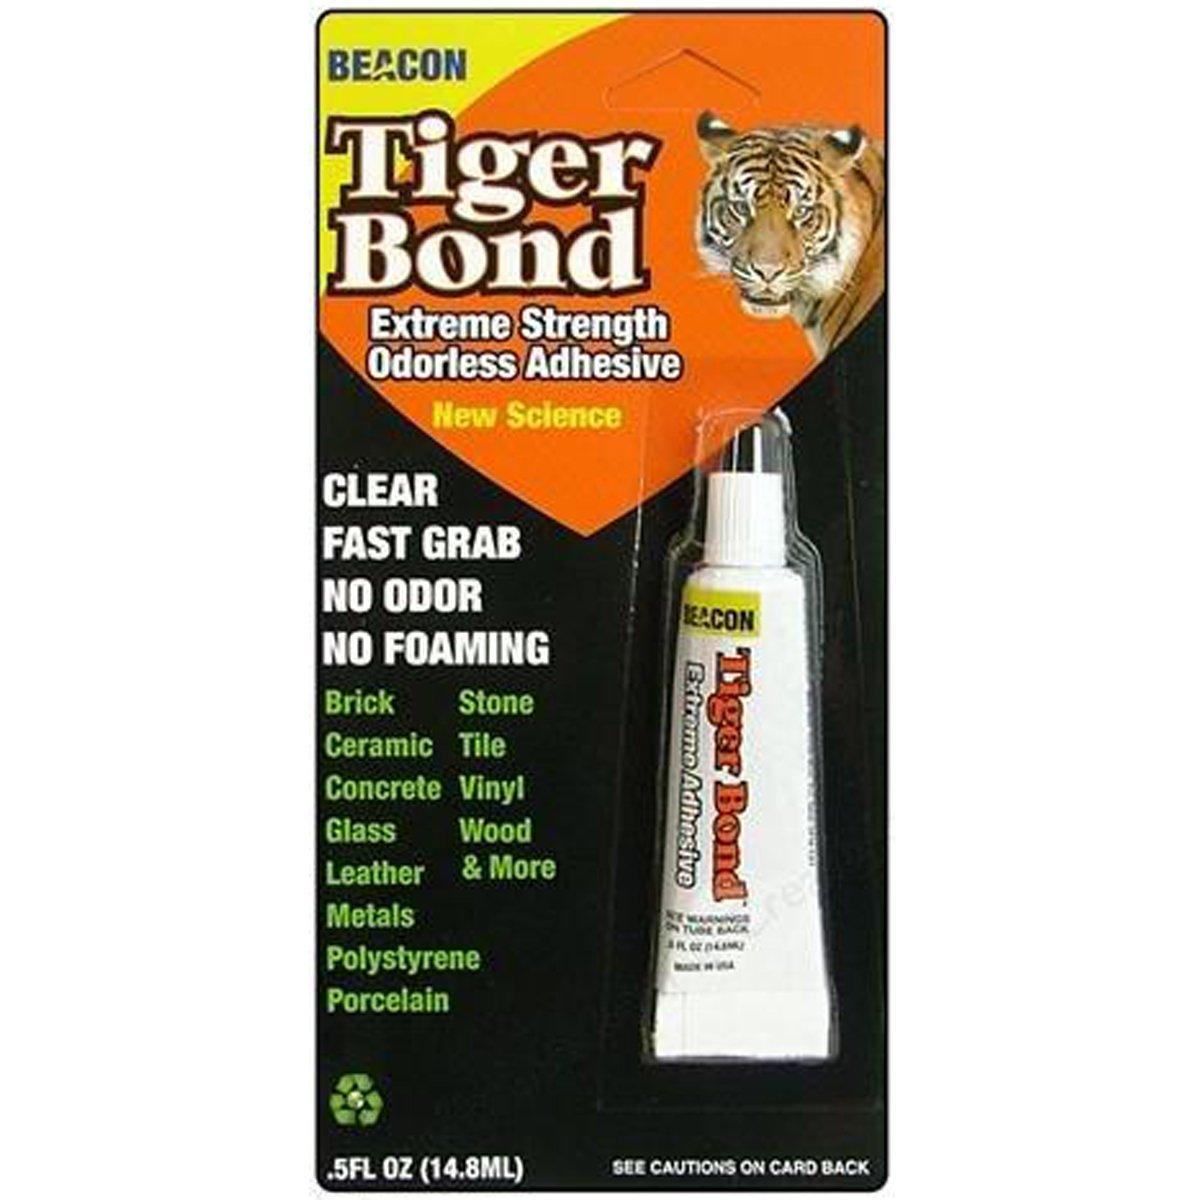 Tiger Bond Extreme Adhesive-.5oz